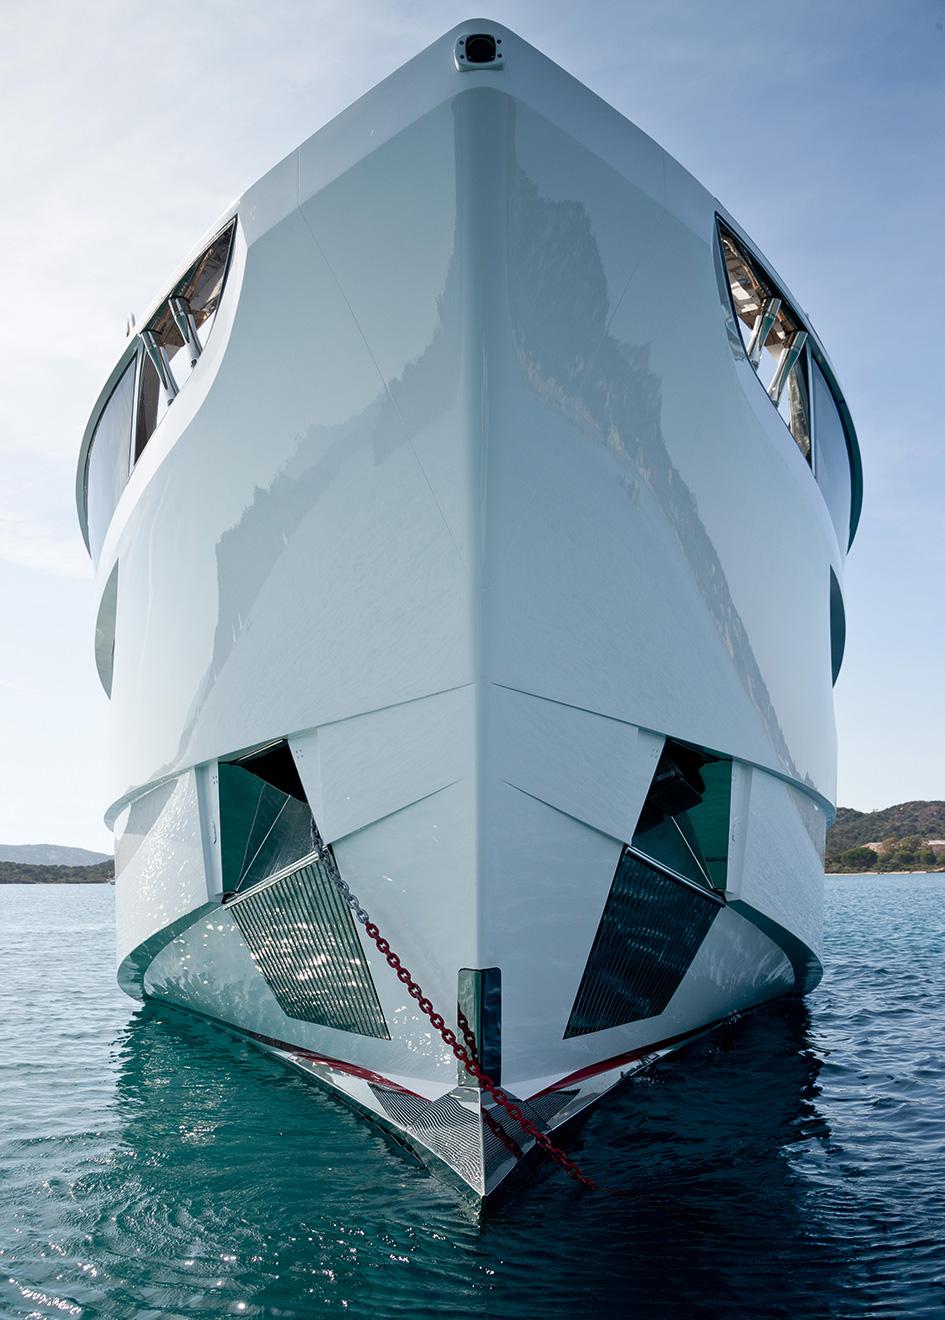 the-bow-of-the-dominator-ilumen-yacht-kalliente-credit-jeff-brown-breed-media